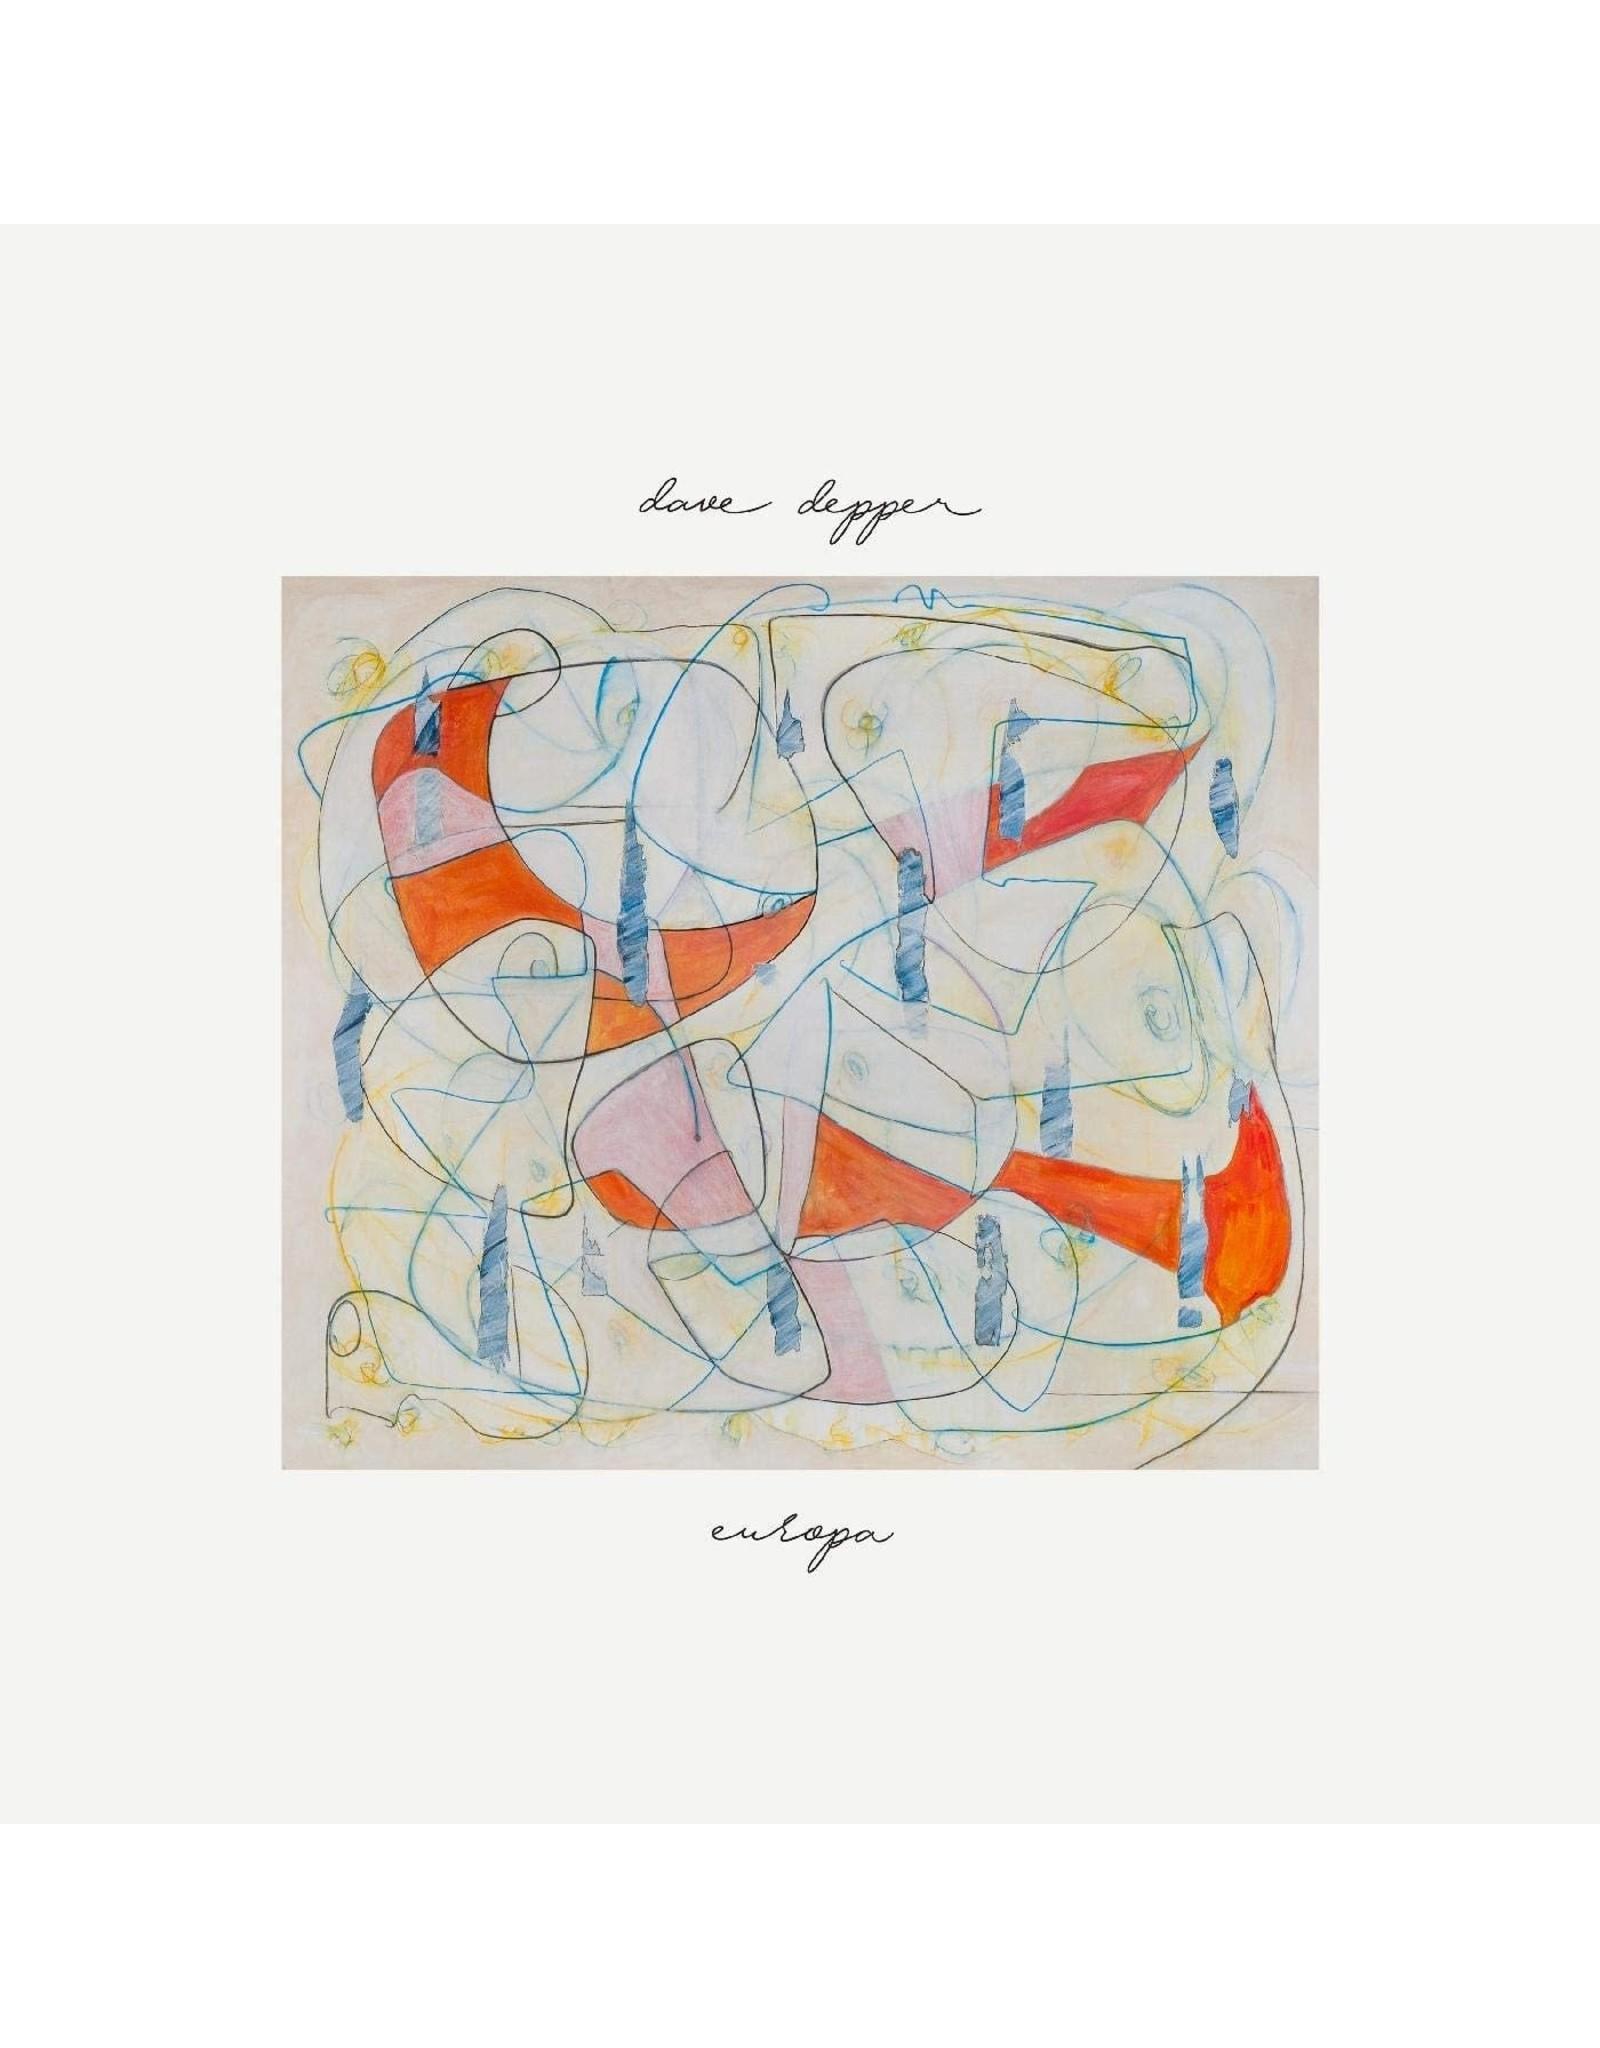 Dave Depper - Europa (Exclusive Light Blue Vinyl)